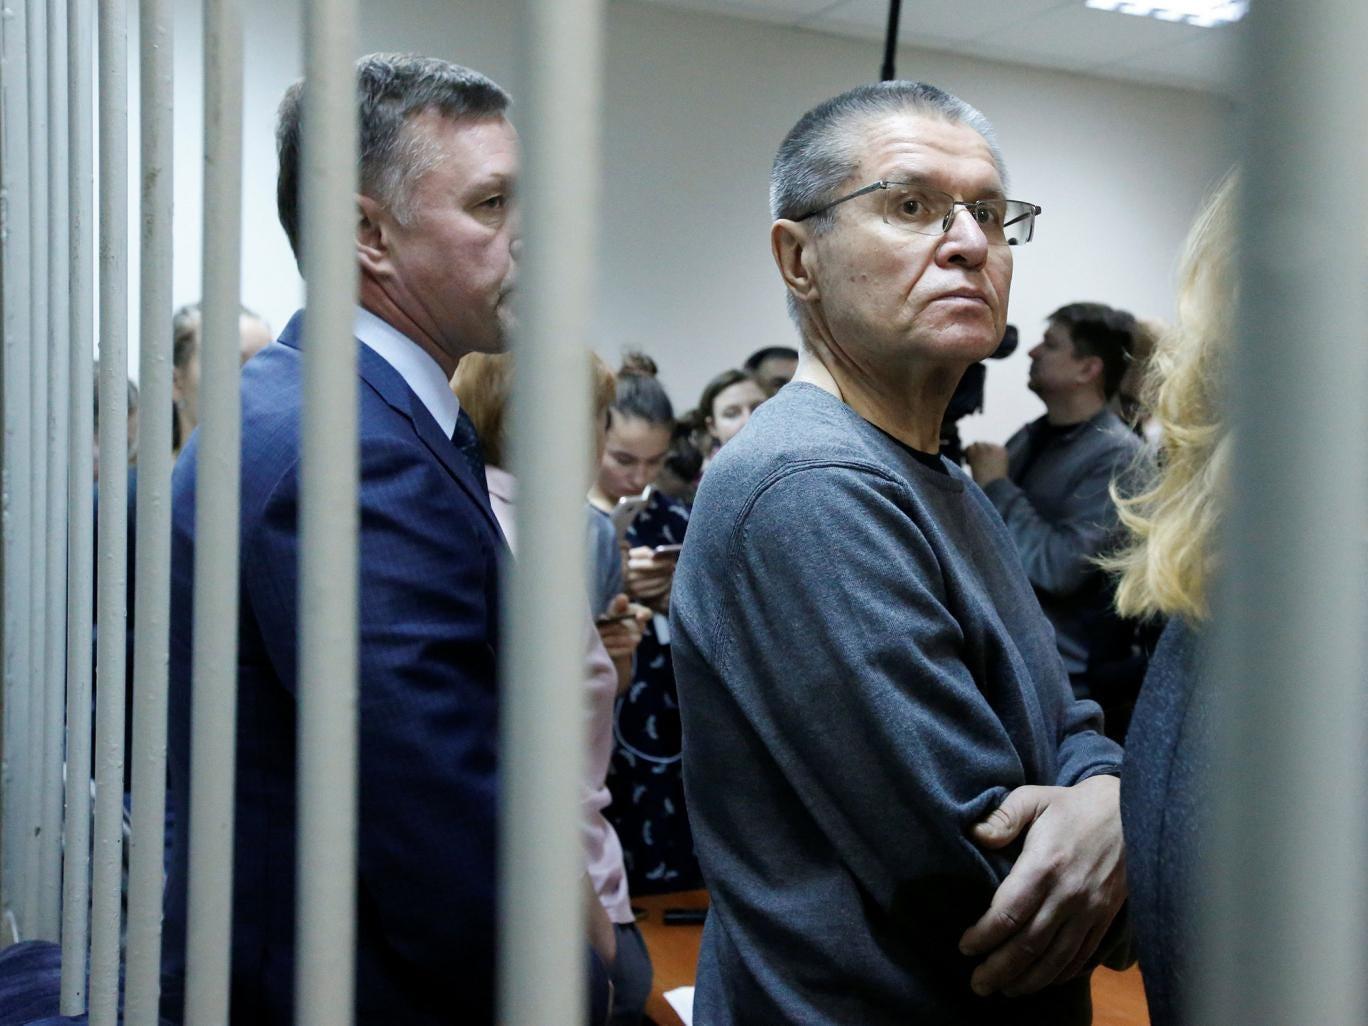 Alexey Ulyukaev considers his sentence unfair 15.12.2017 2